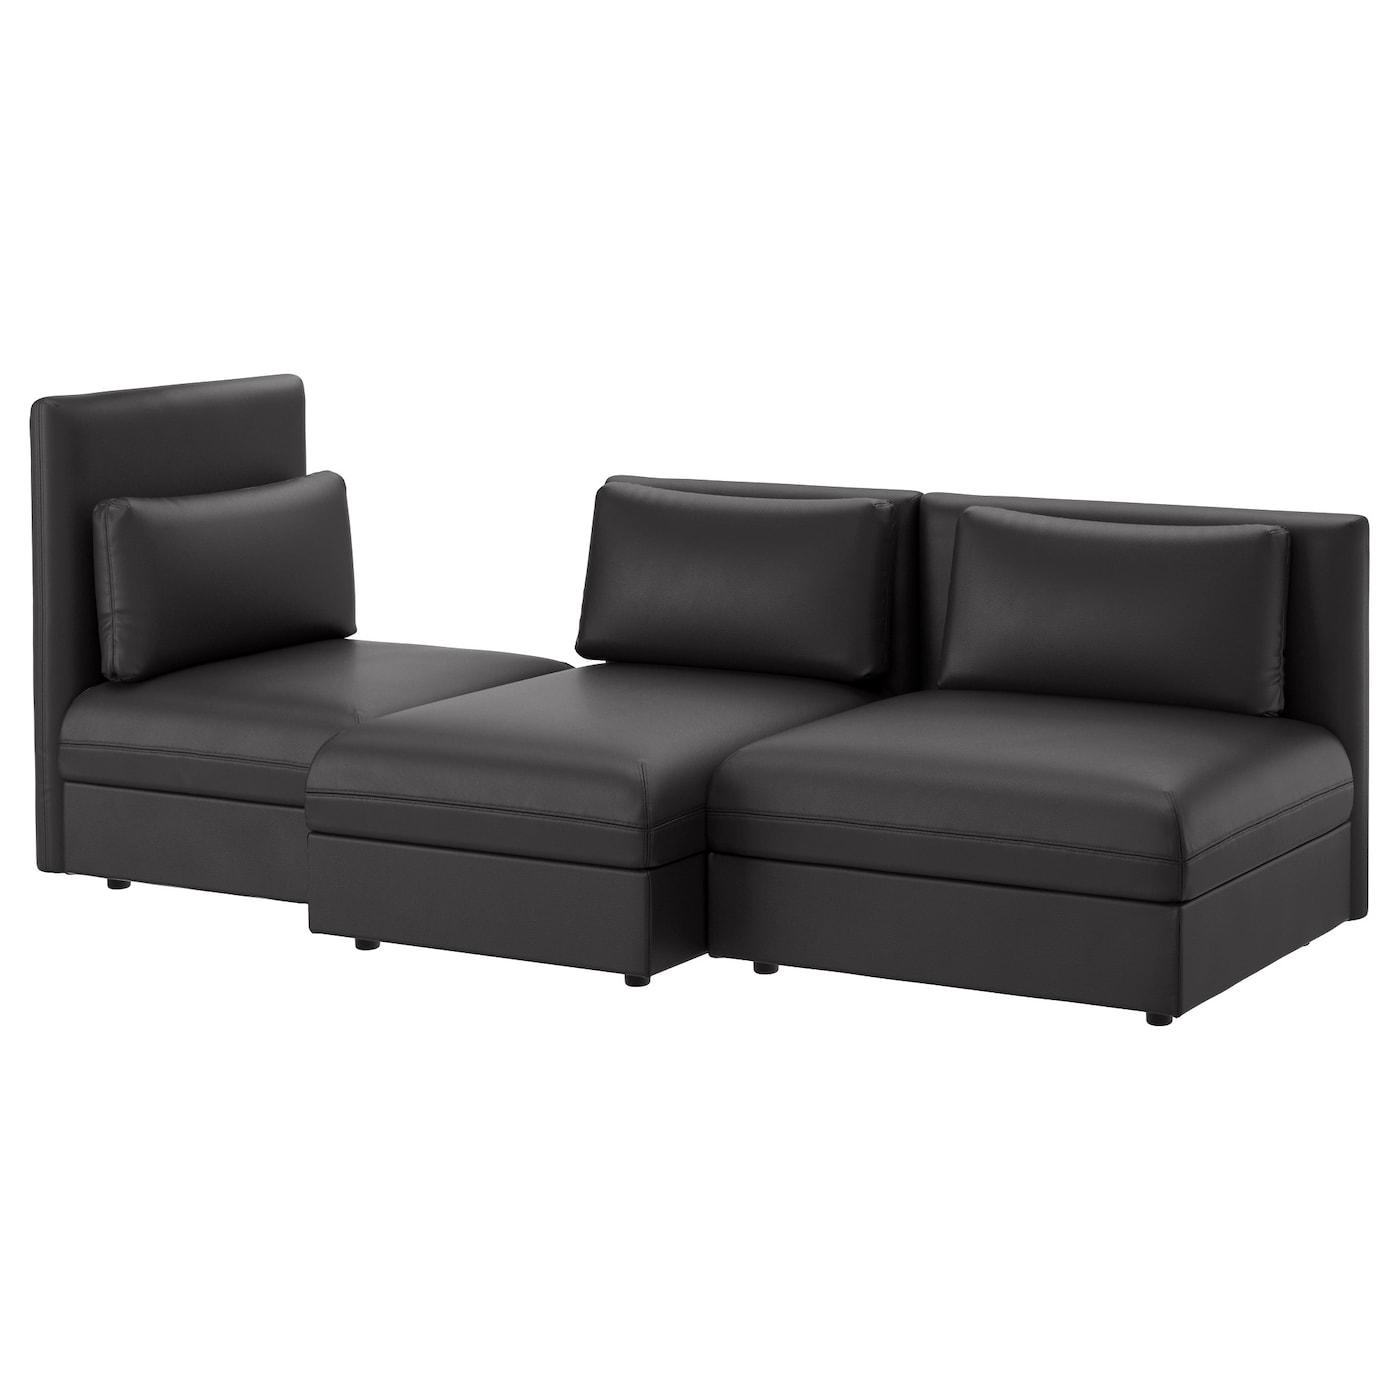 IKEA VALLENTUNA 3 Seat Sofa 10 Year Guarantee. Read About The Terms In The